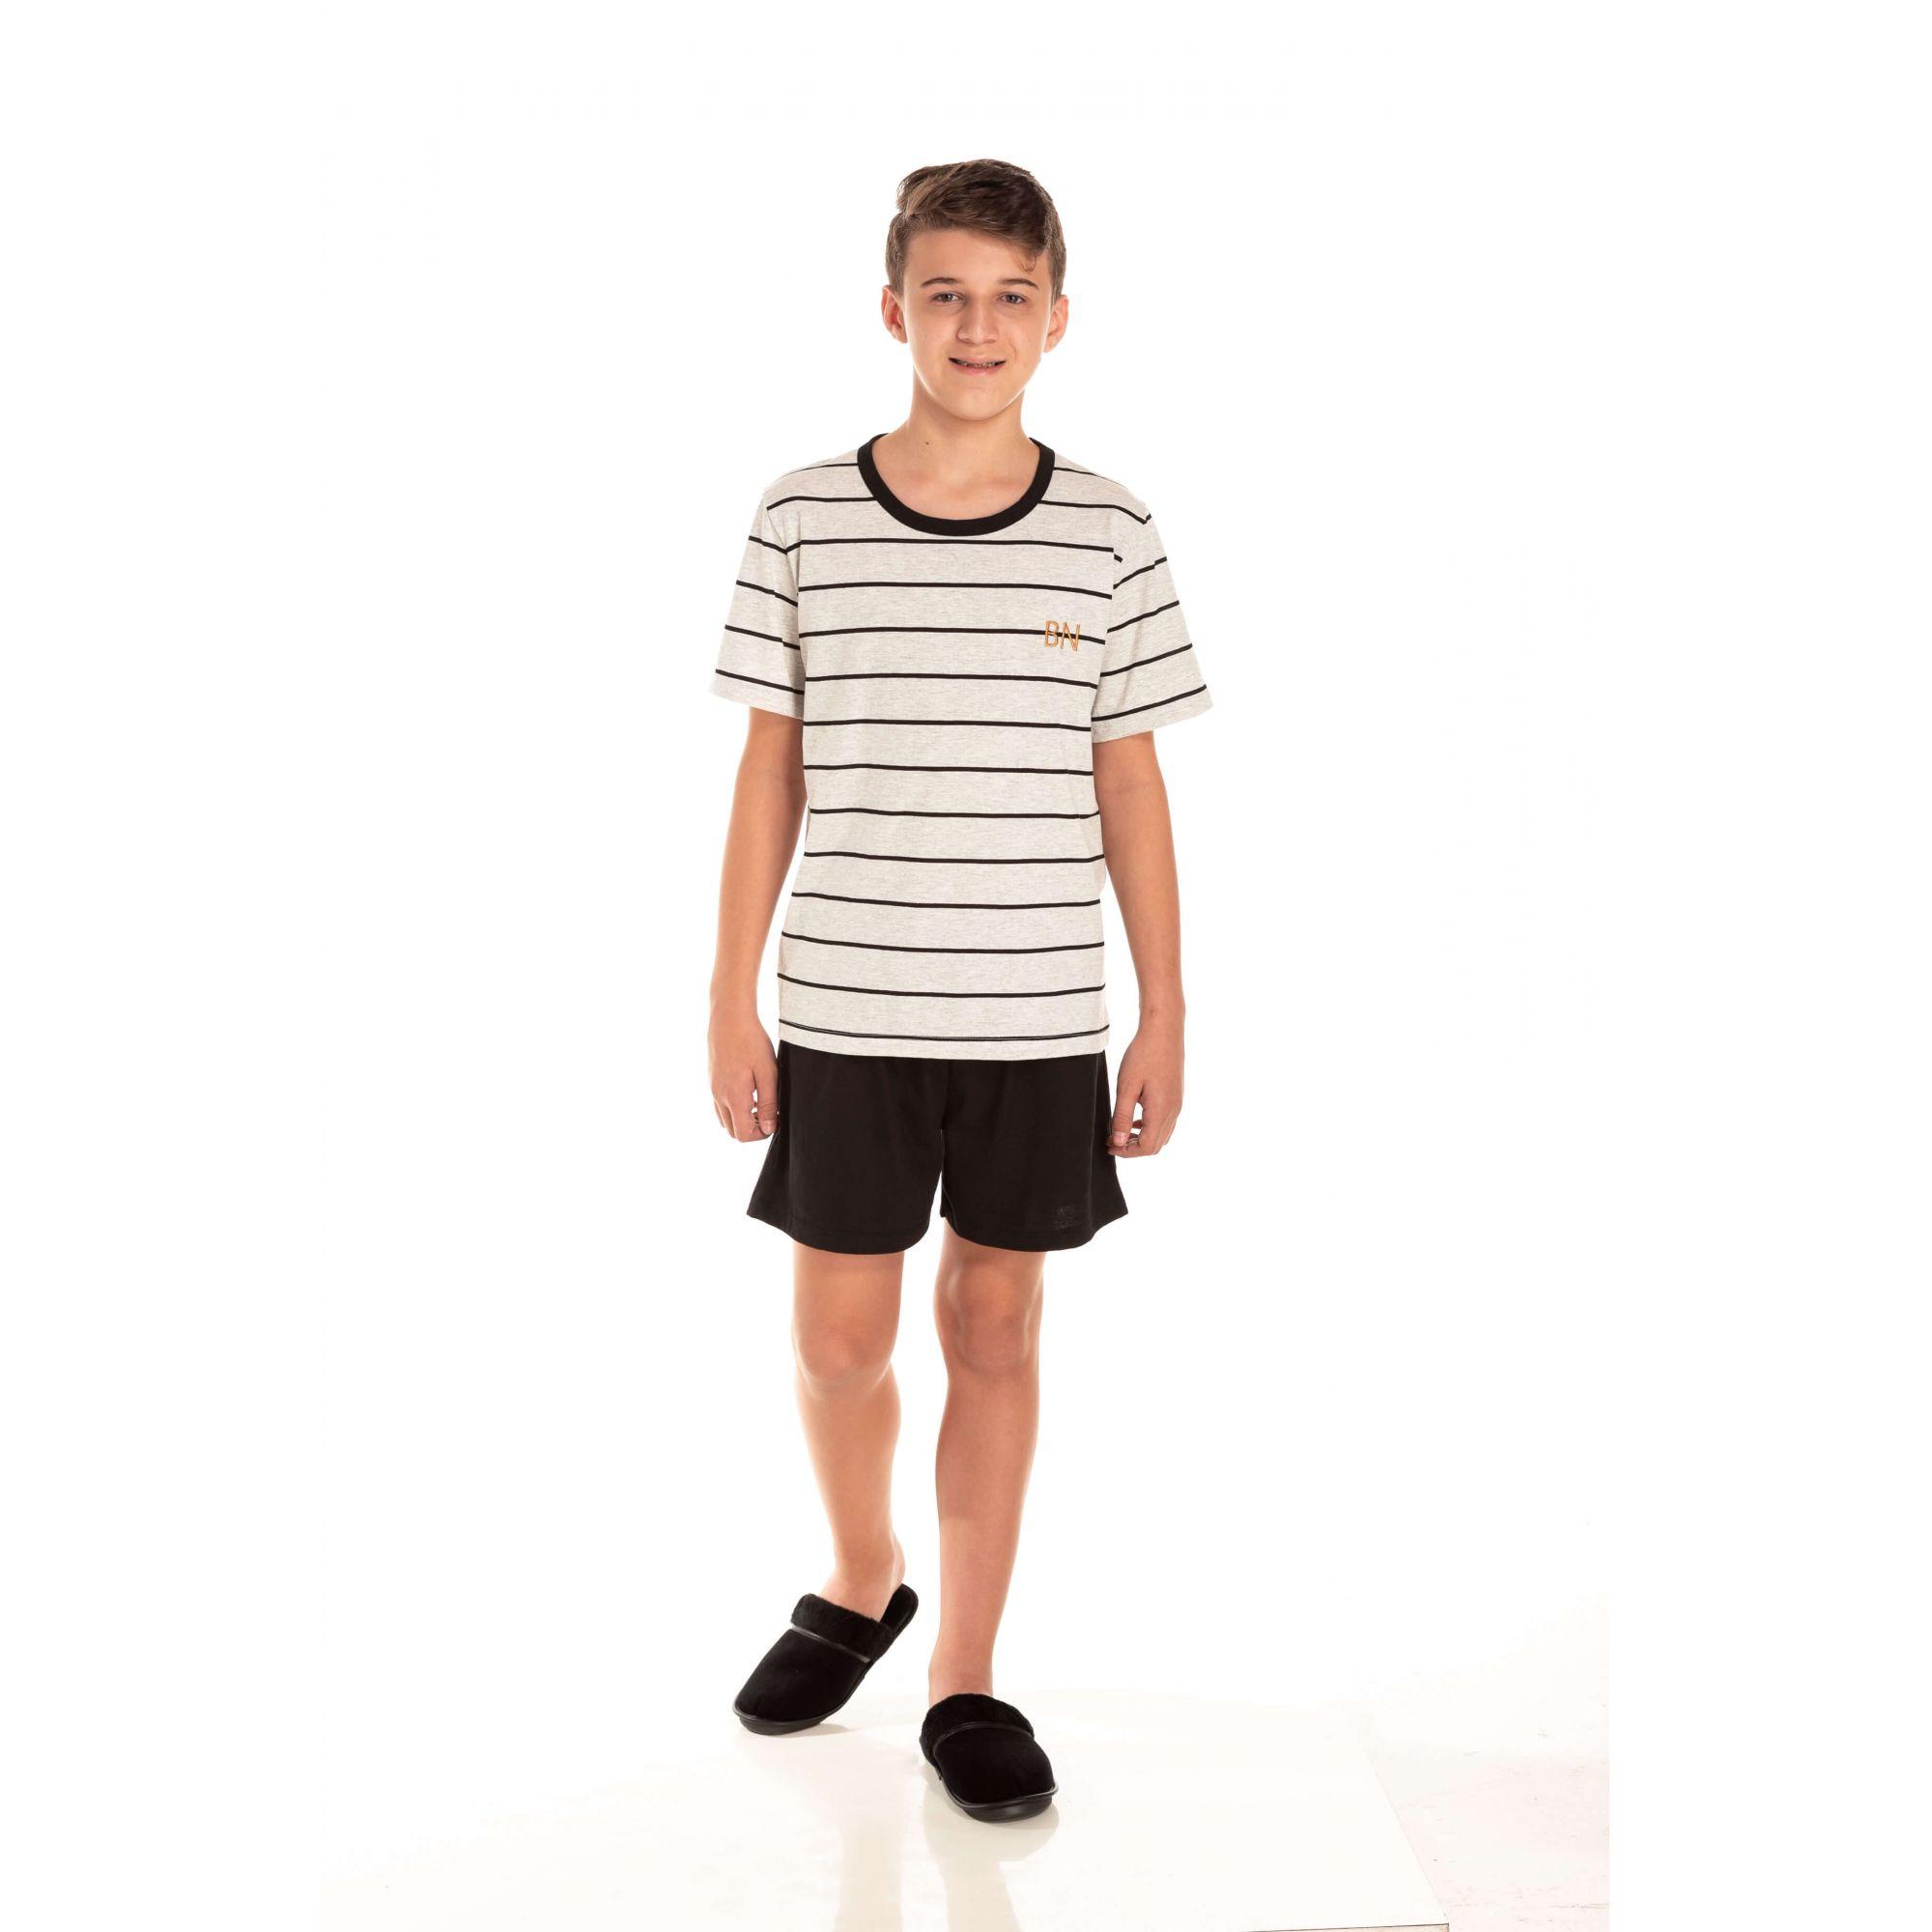 Pijama Juvenil Masculino Listrado - Pérola